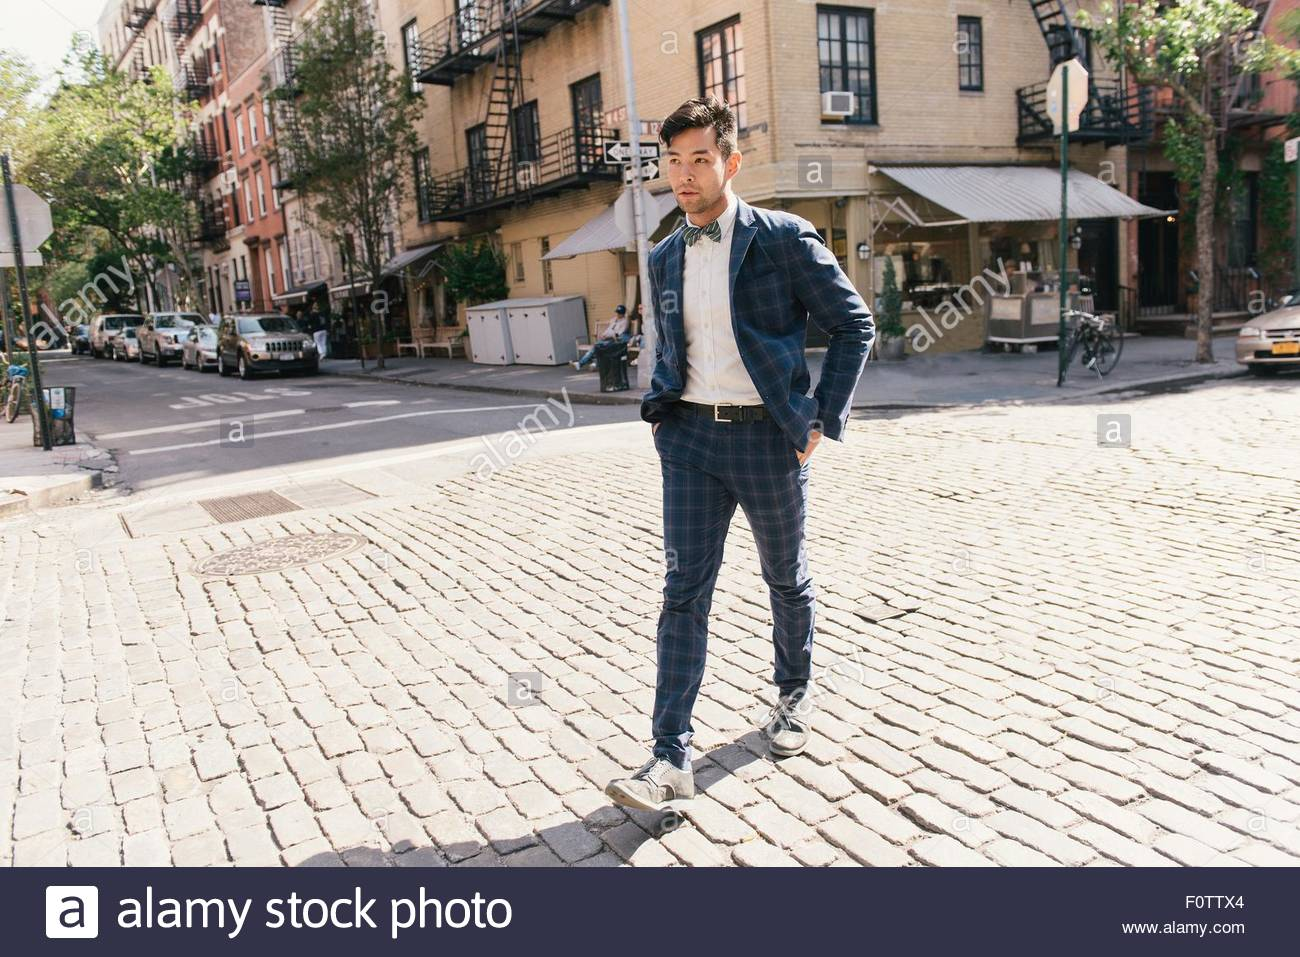 Worried businessman crossing road, West Village, Manhattan, USA - Stock Image